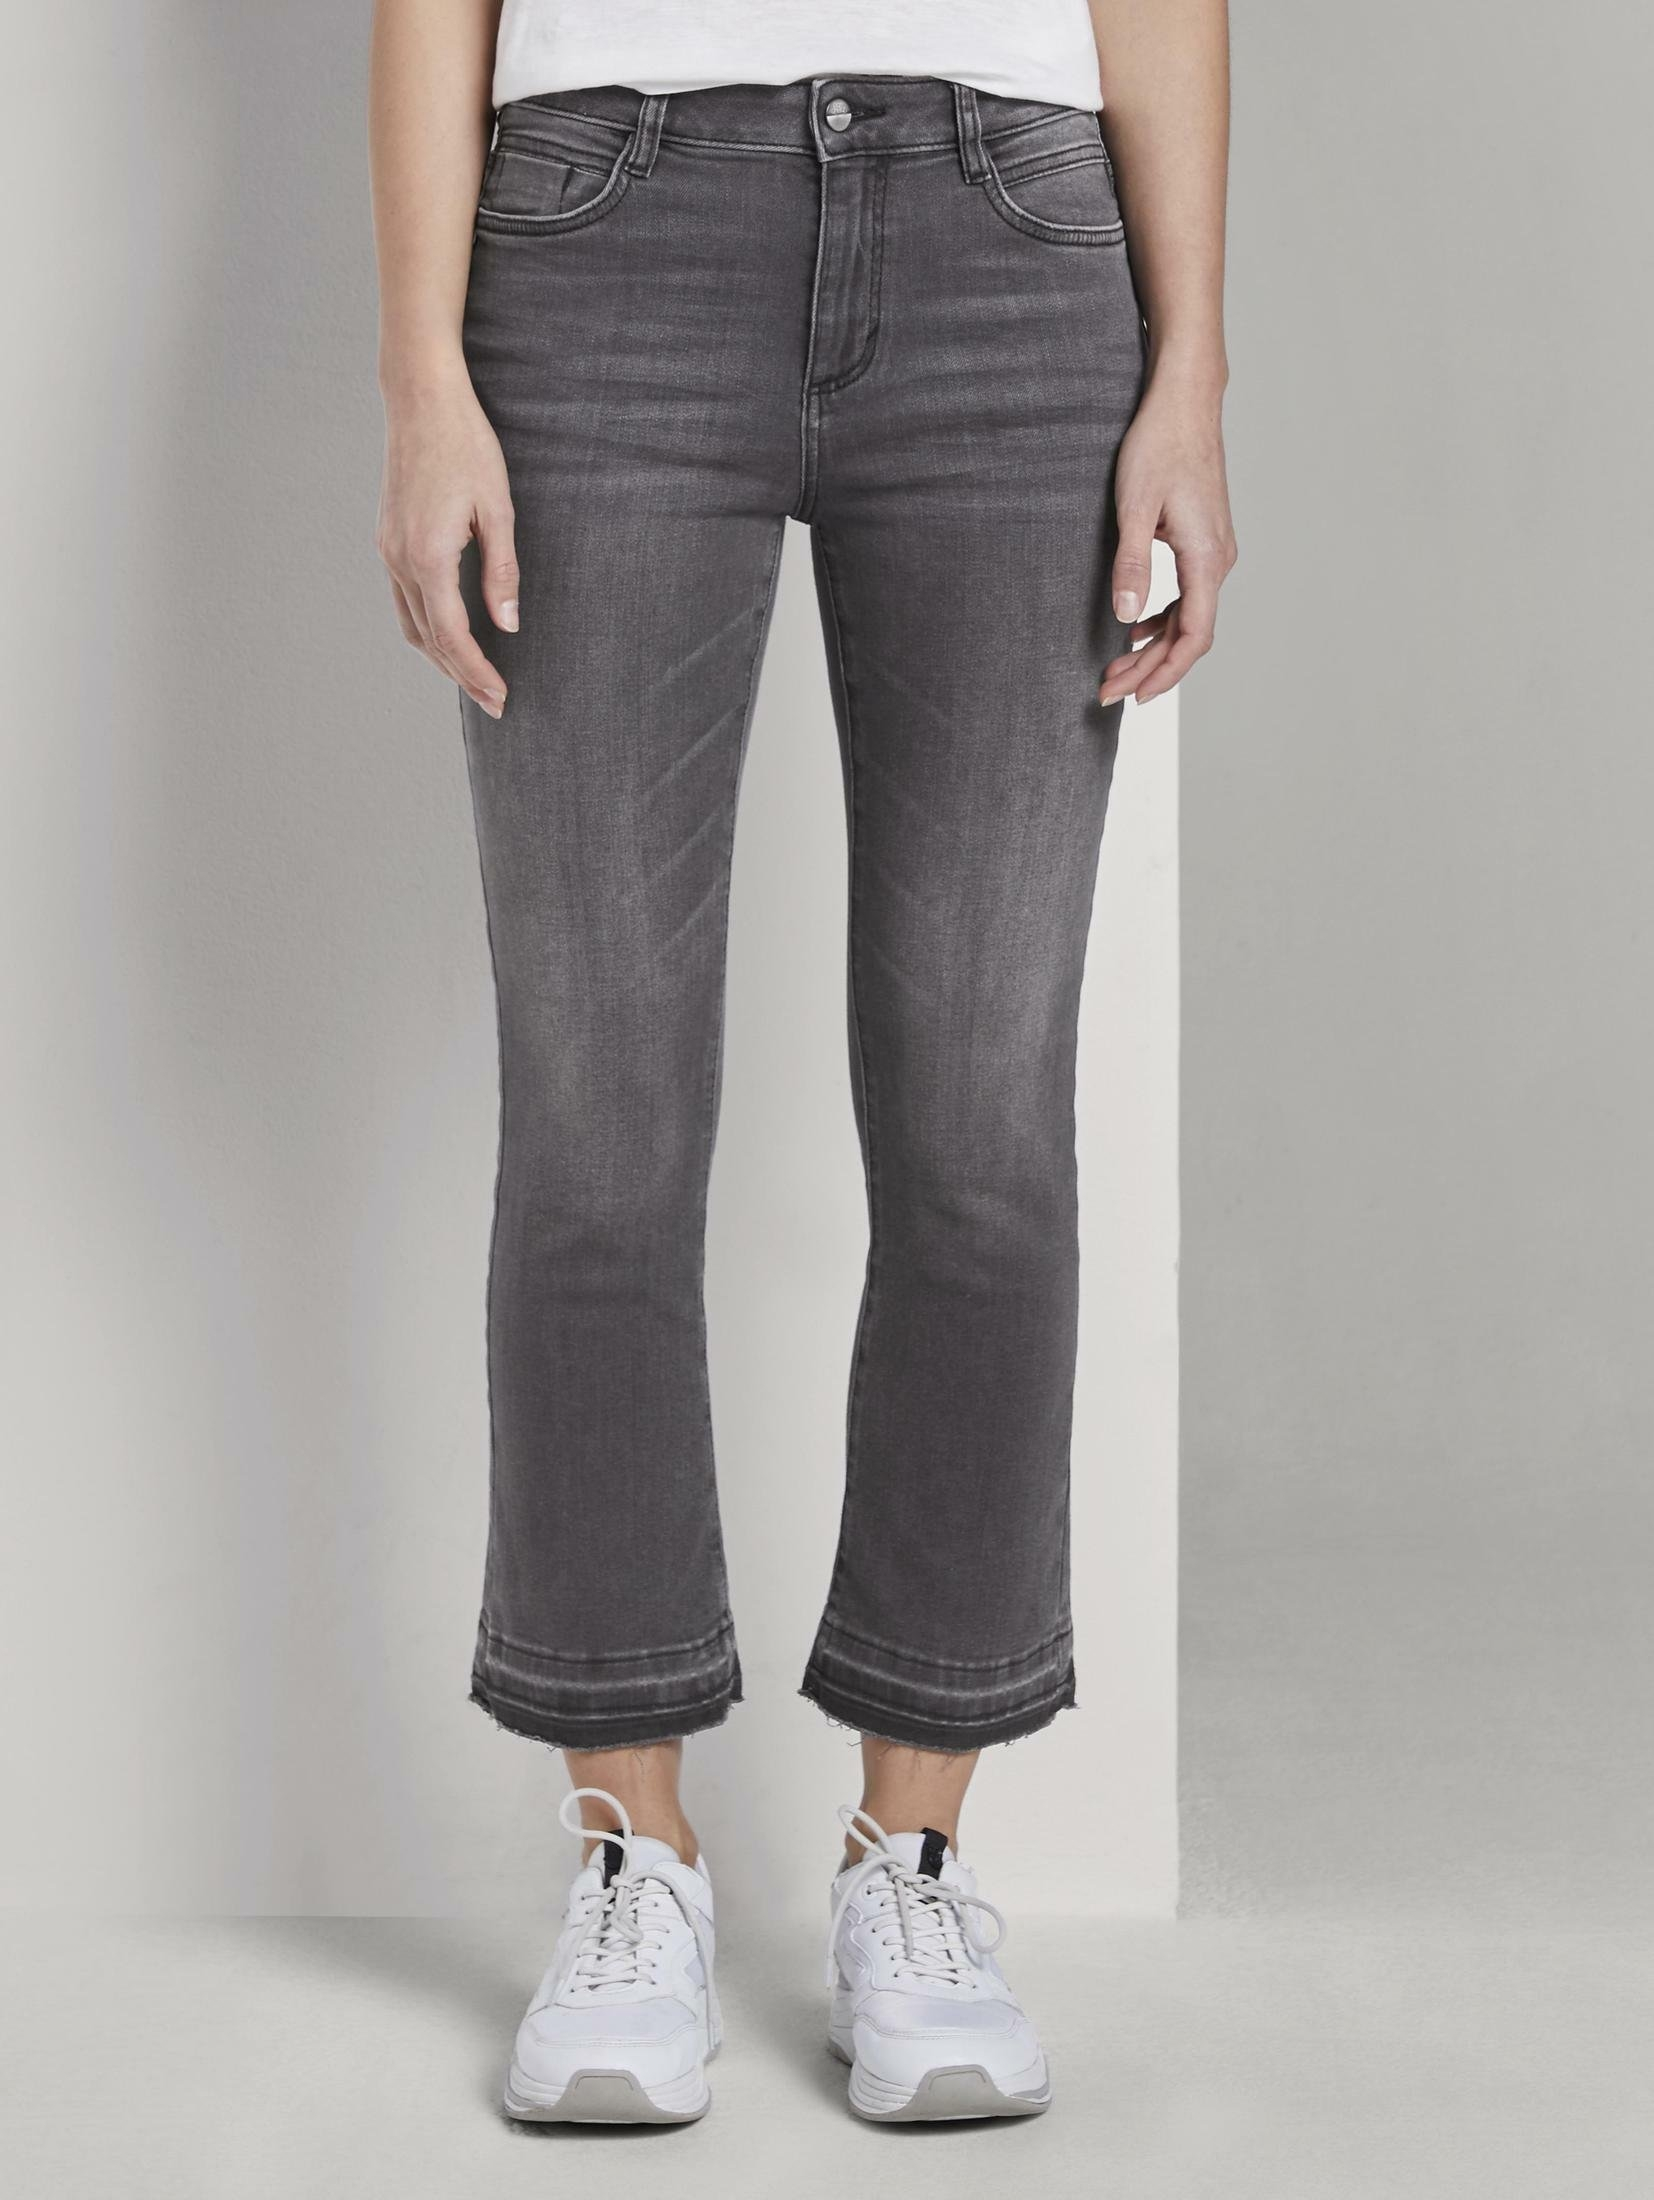 Tom Tailor bootcut jeans Kate Kick Flare Jeans voordelig en veilig online kopen